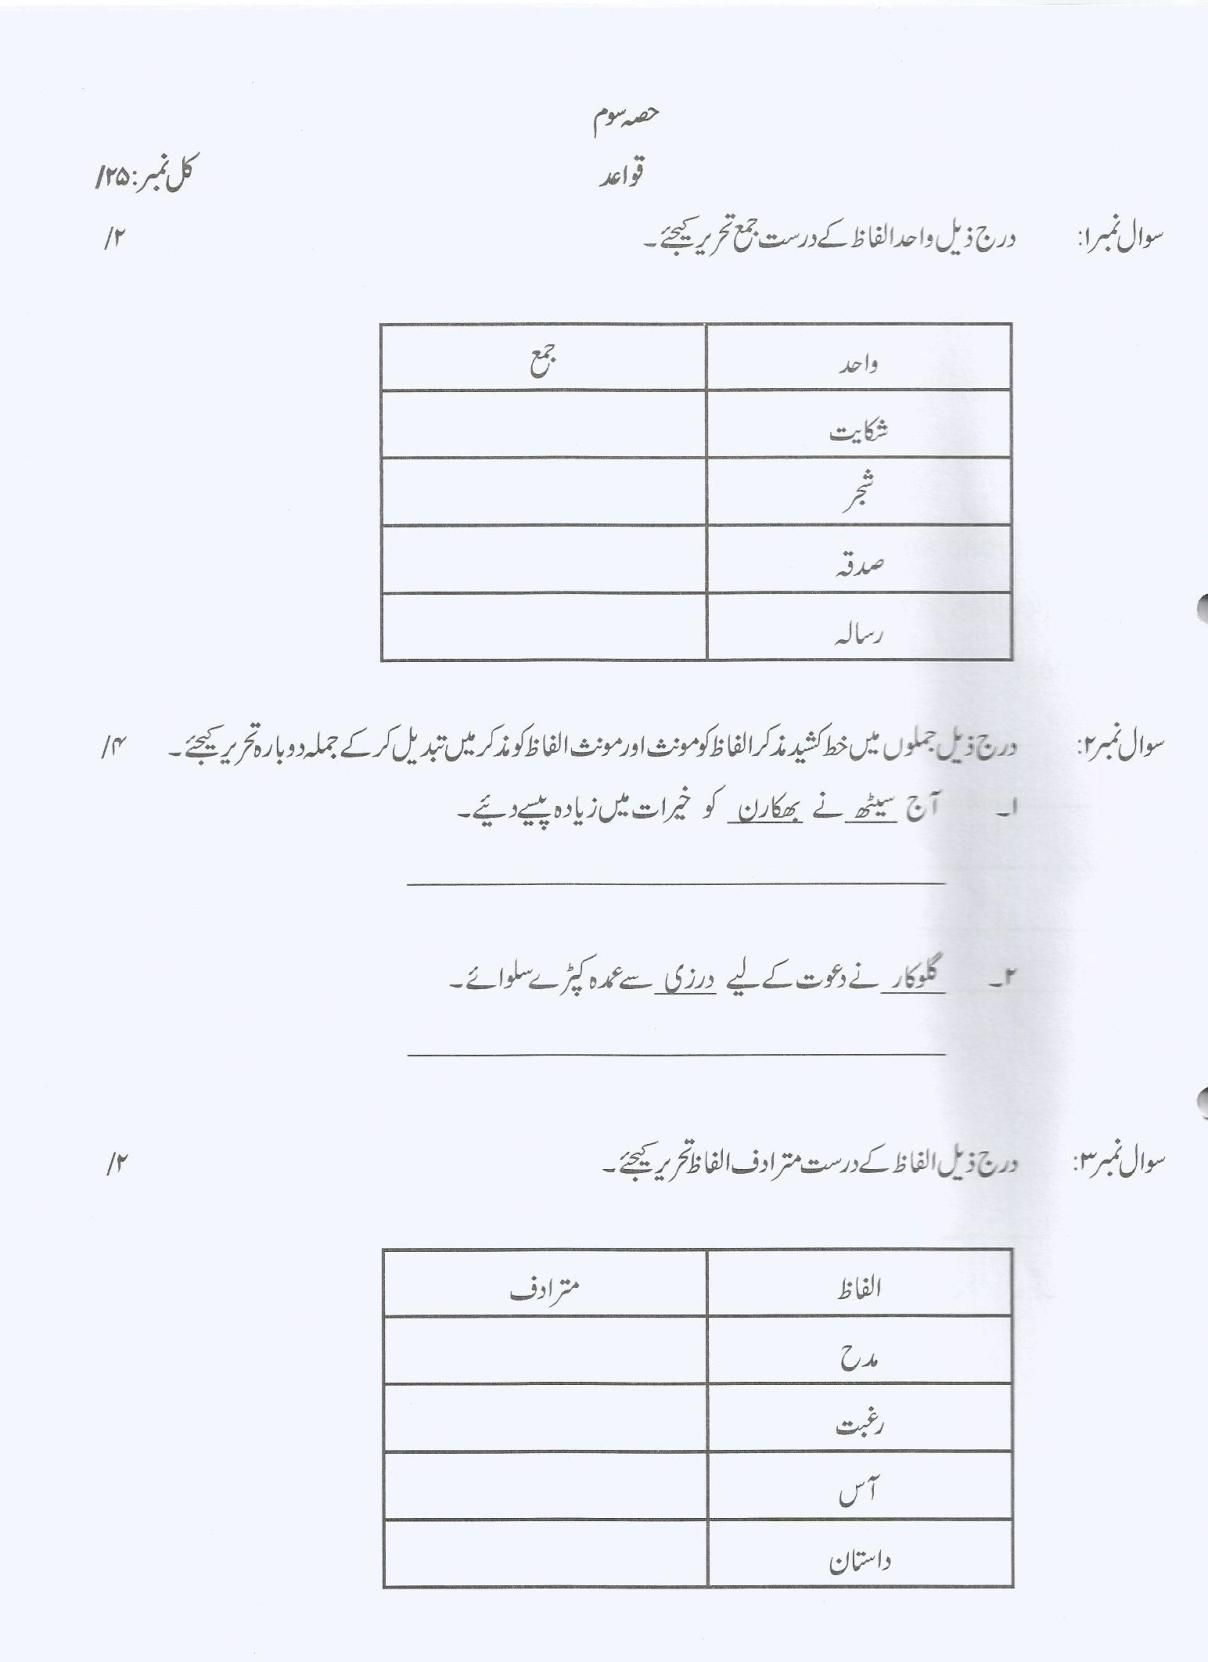 Urdu Grammar Worksheets   Printable Worksheets and Activities for Teachers [ 1662 x 1208 Pixel ]